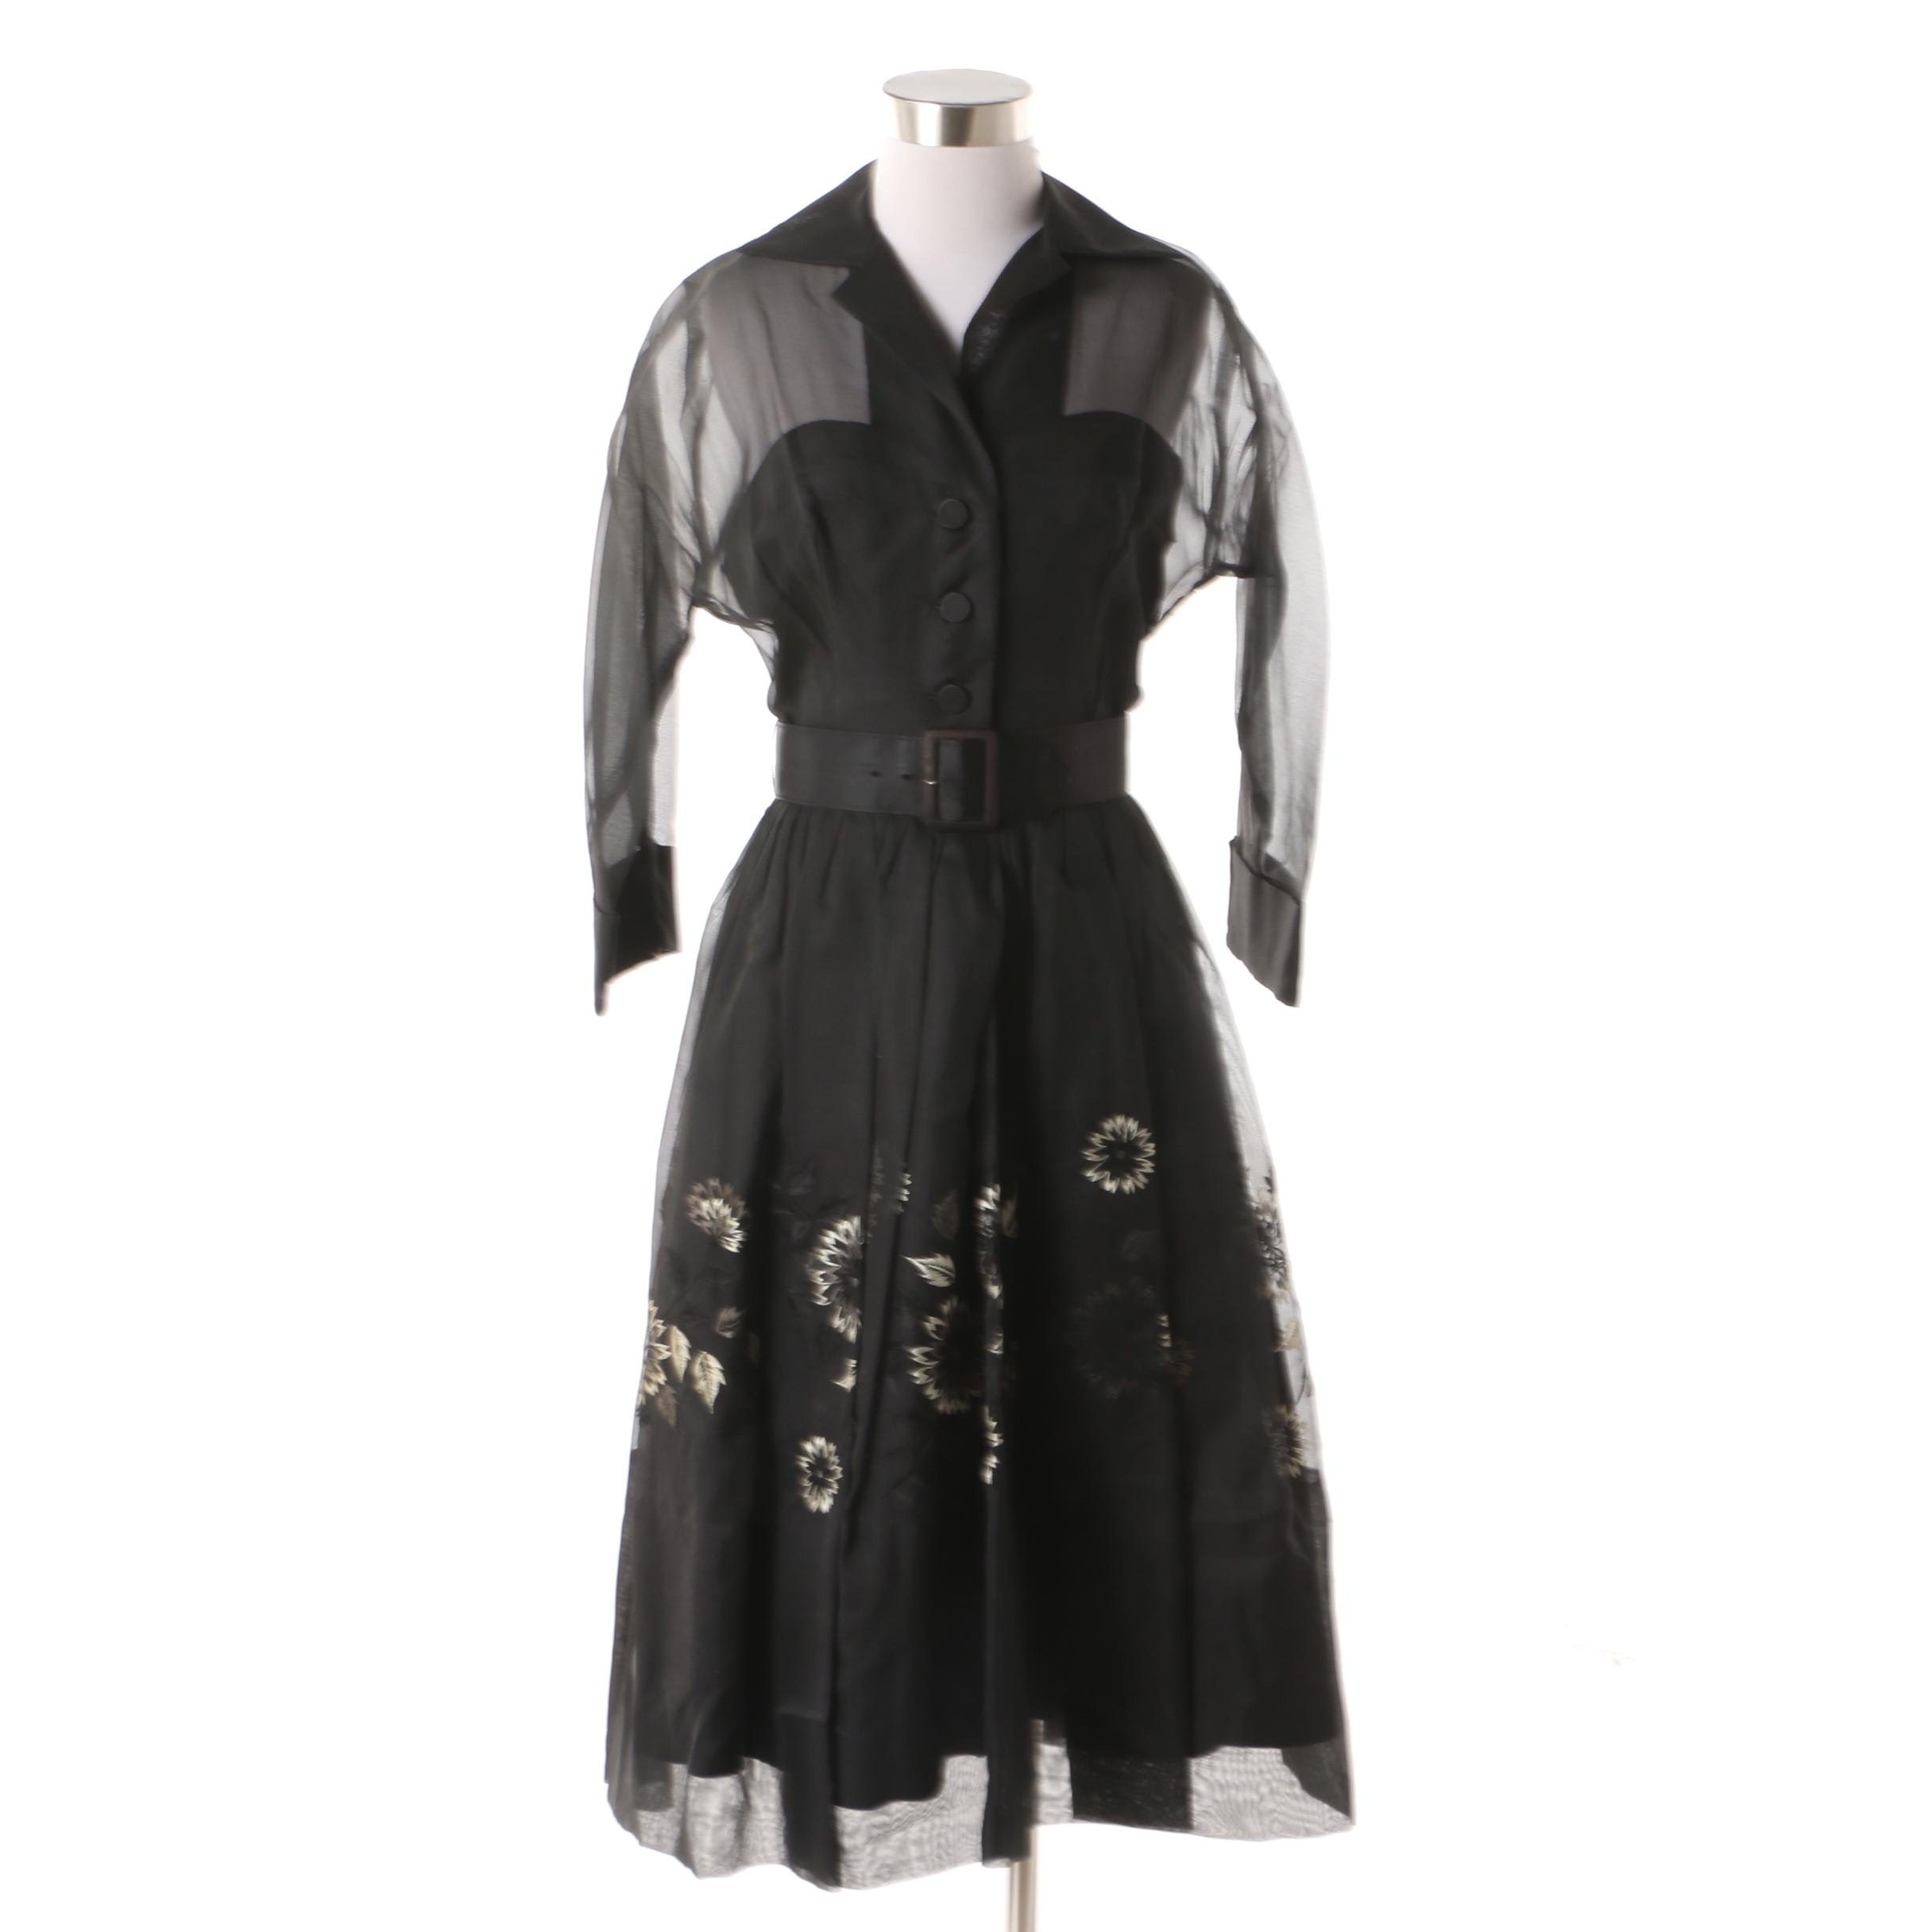 Women's Circa 1950s Vintage Black Embroidered Dress with Waist Belt